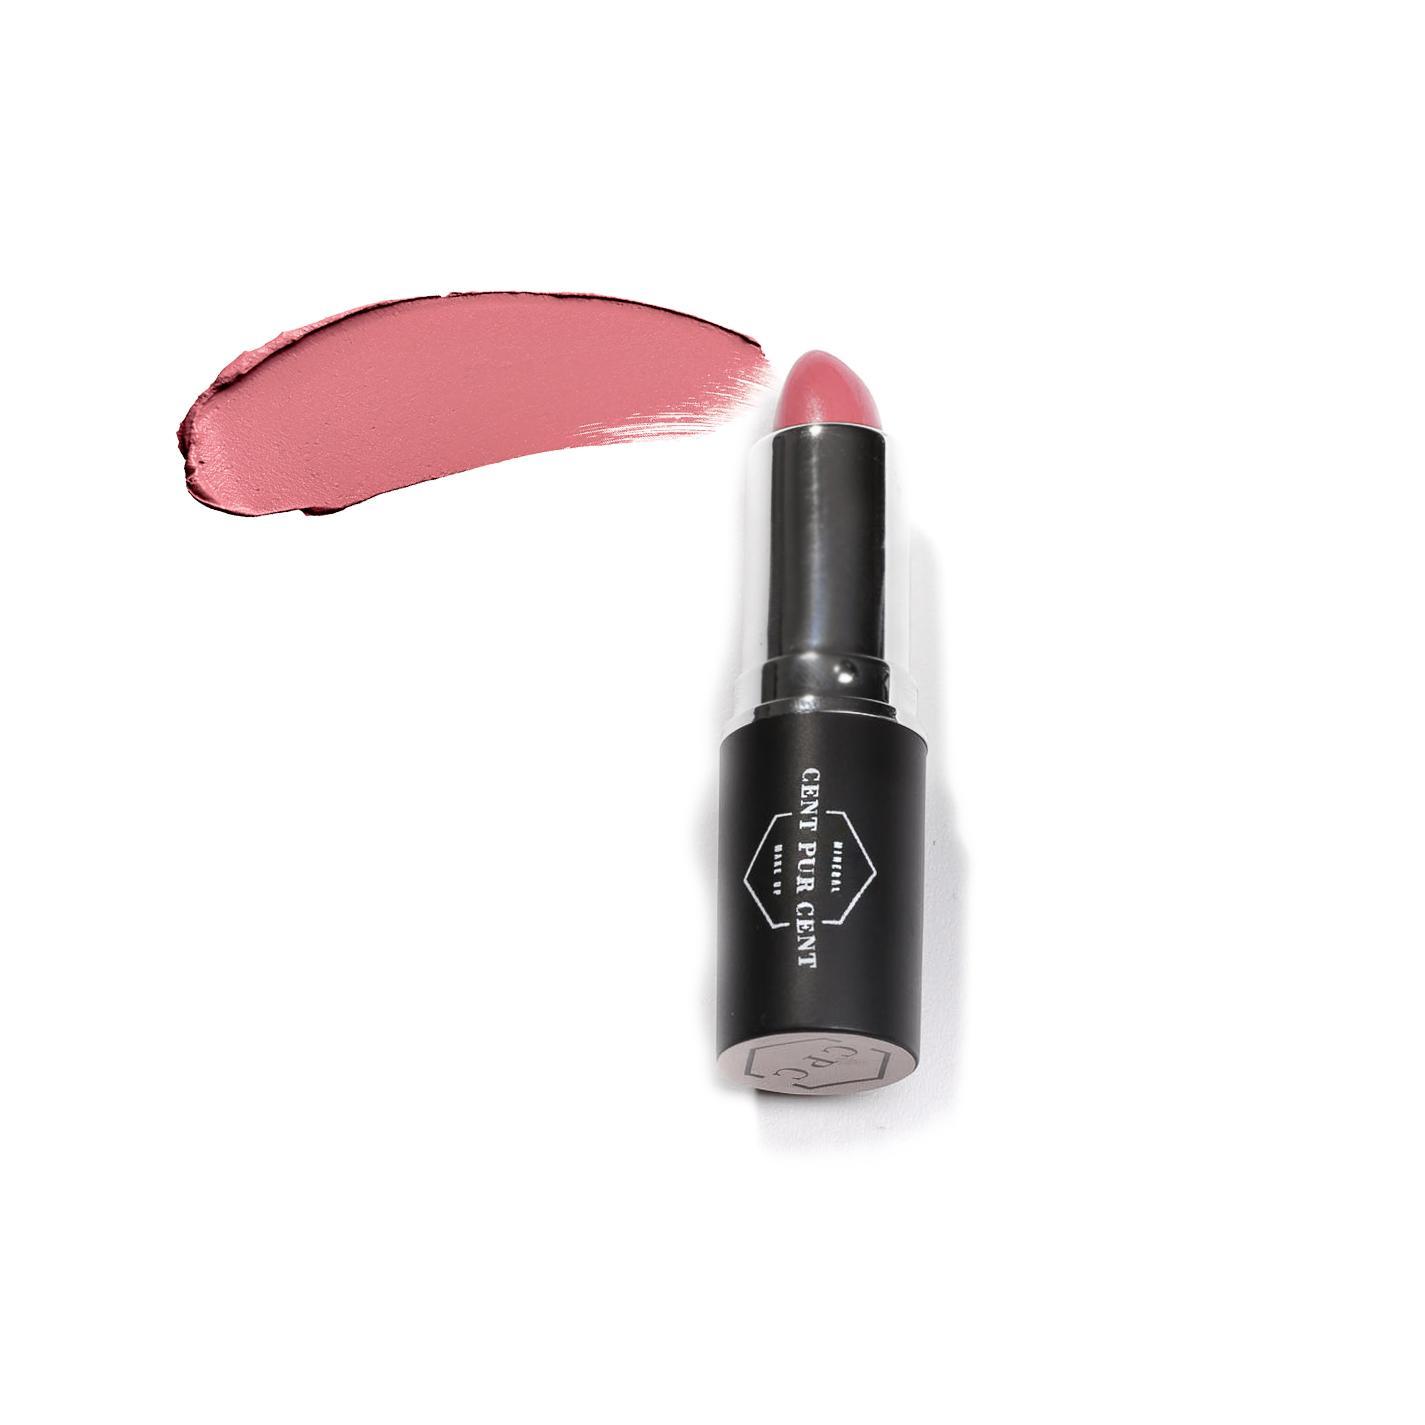 Cent Pur Cent Mineral Lipstick Sourire